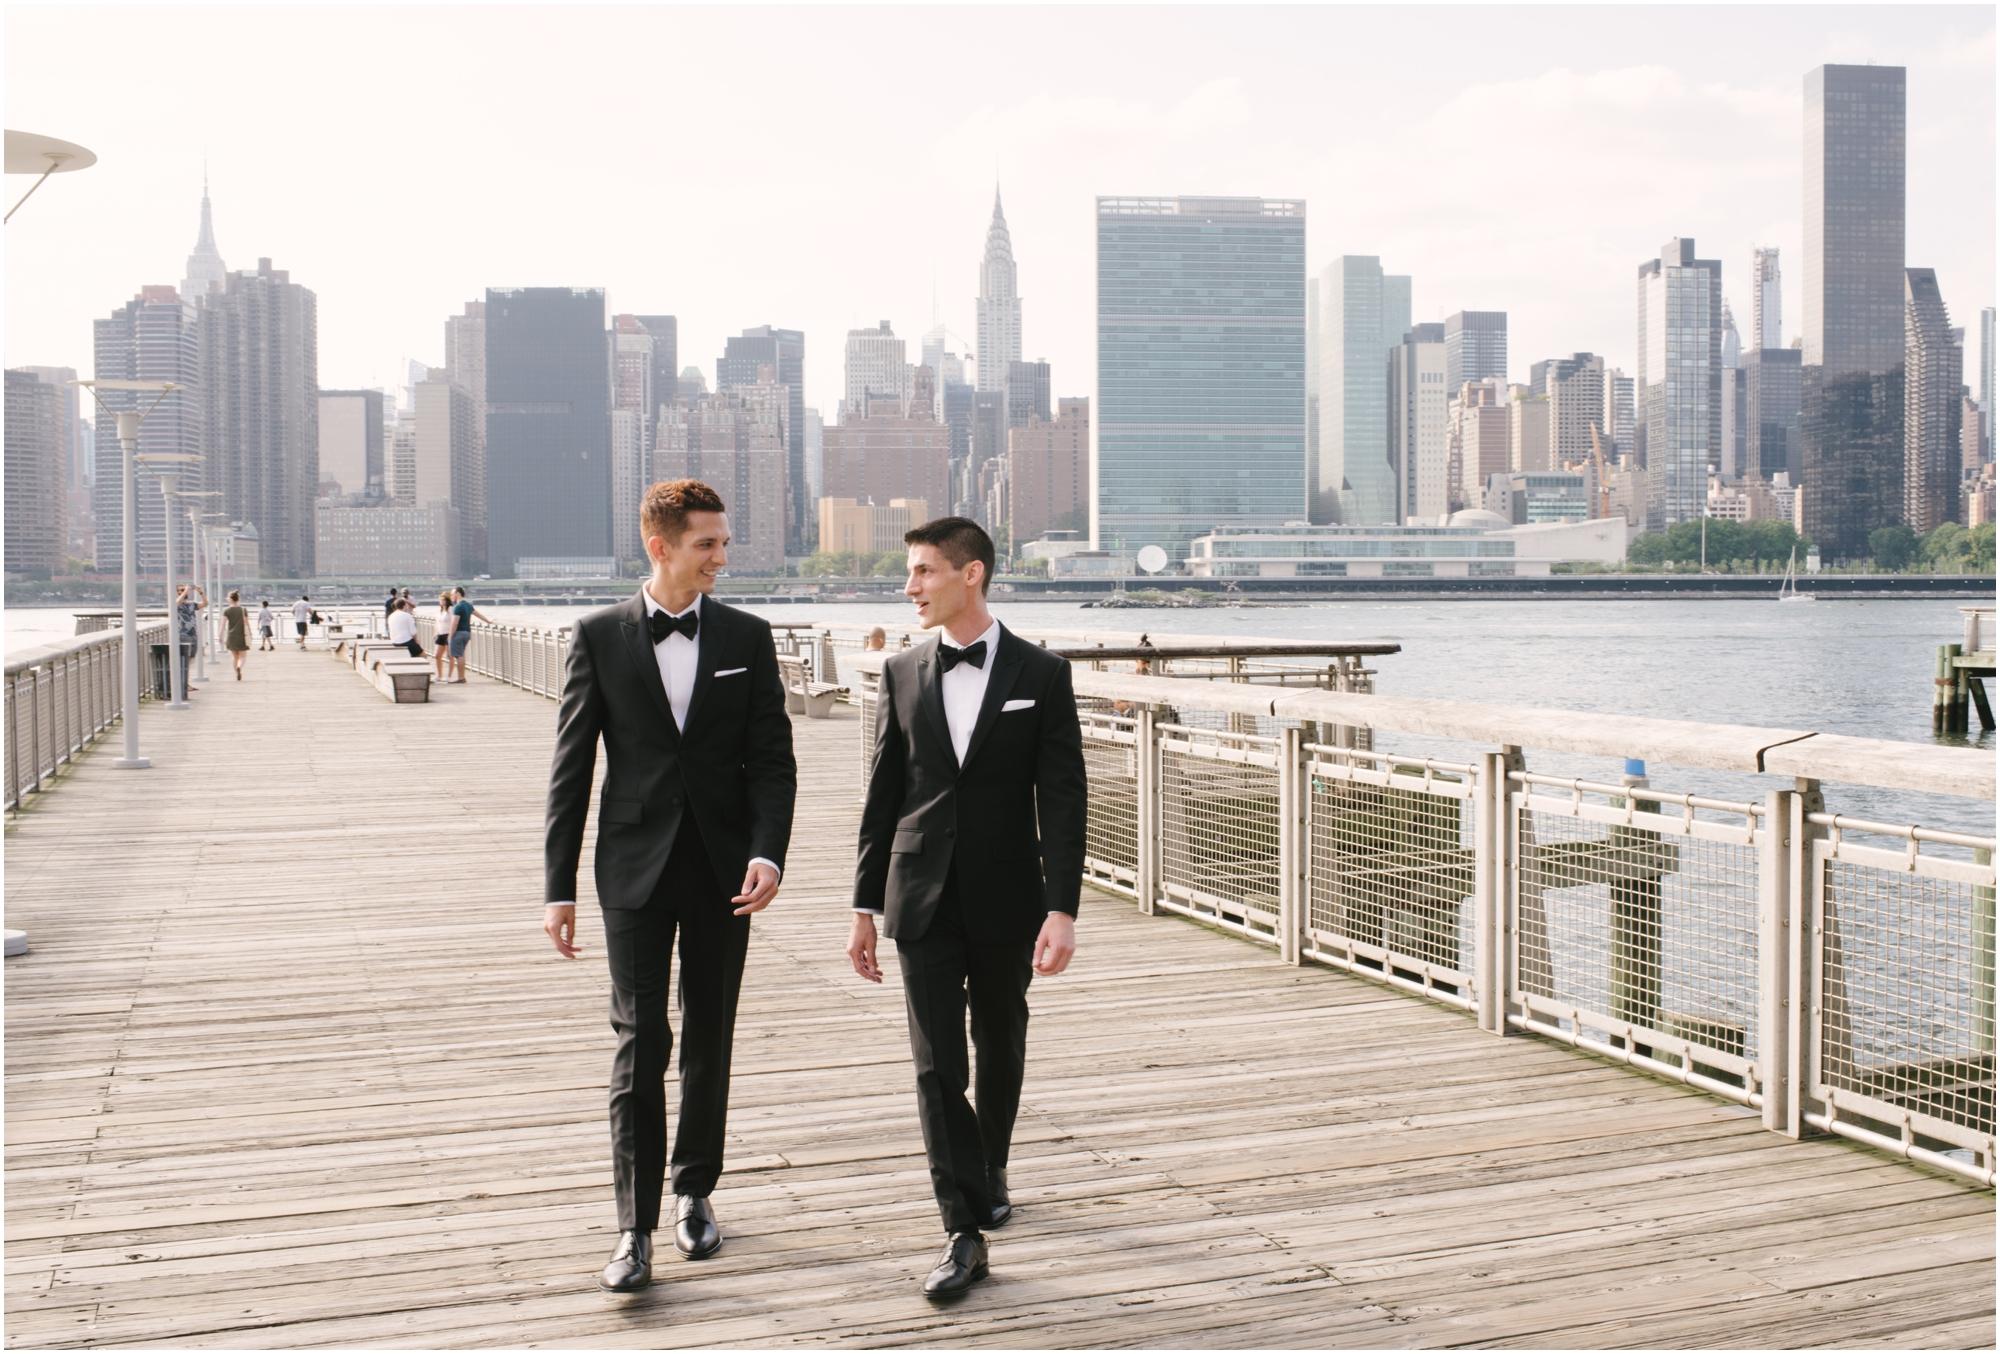 gay-wedding-photographer-williamsburgphotostudios-thefoundry-wedding-photographer_0020.jpg